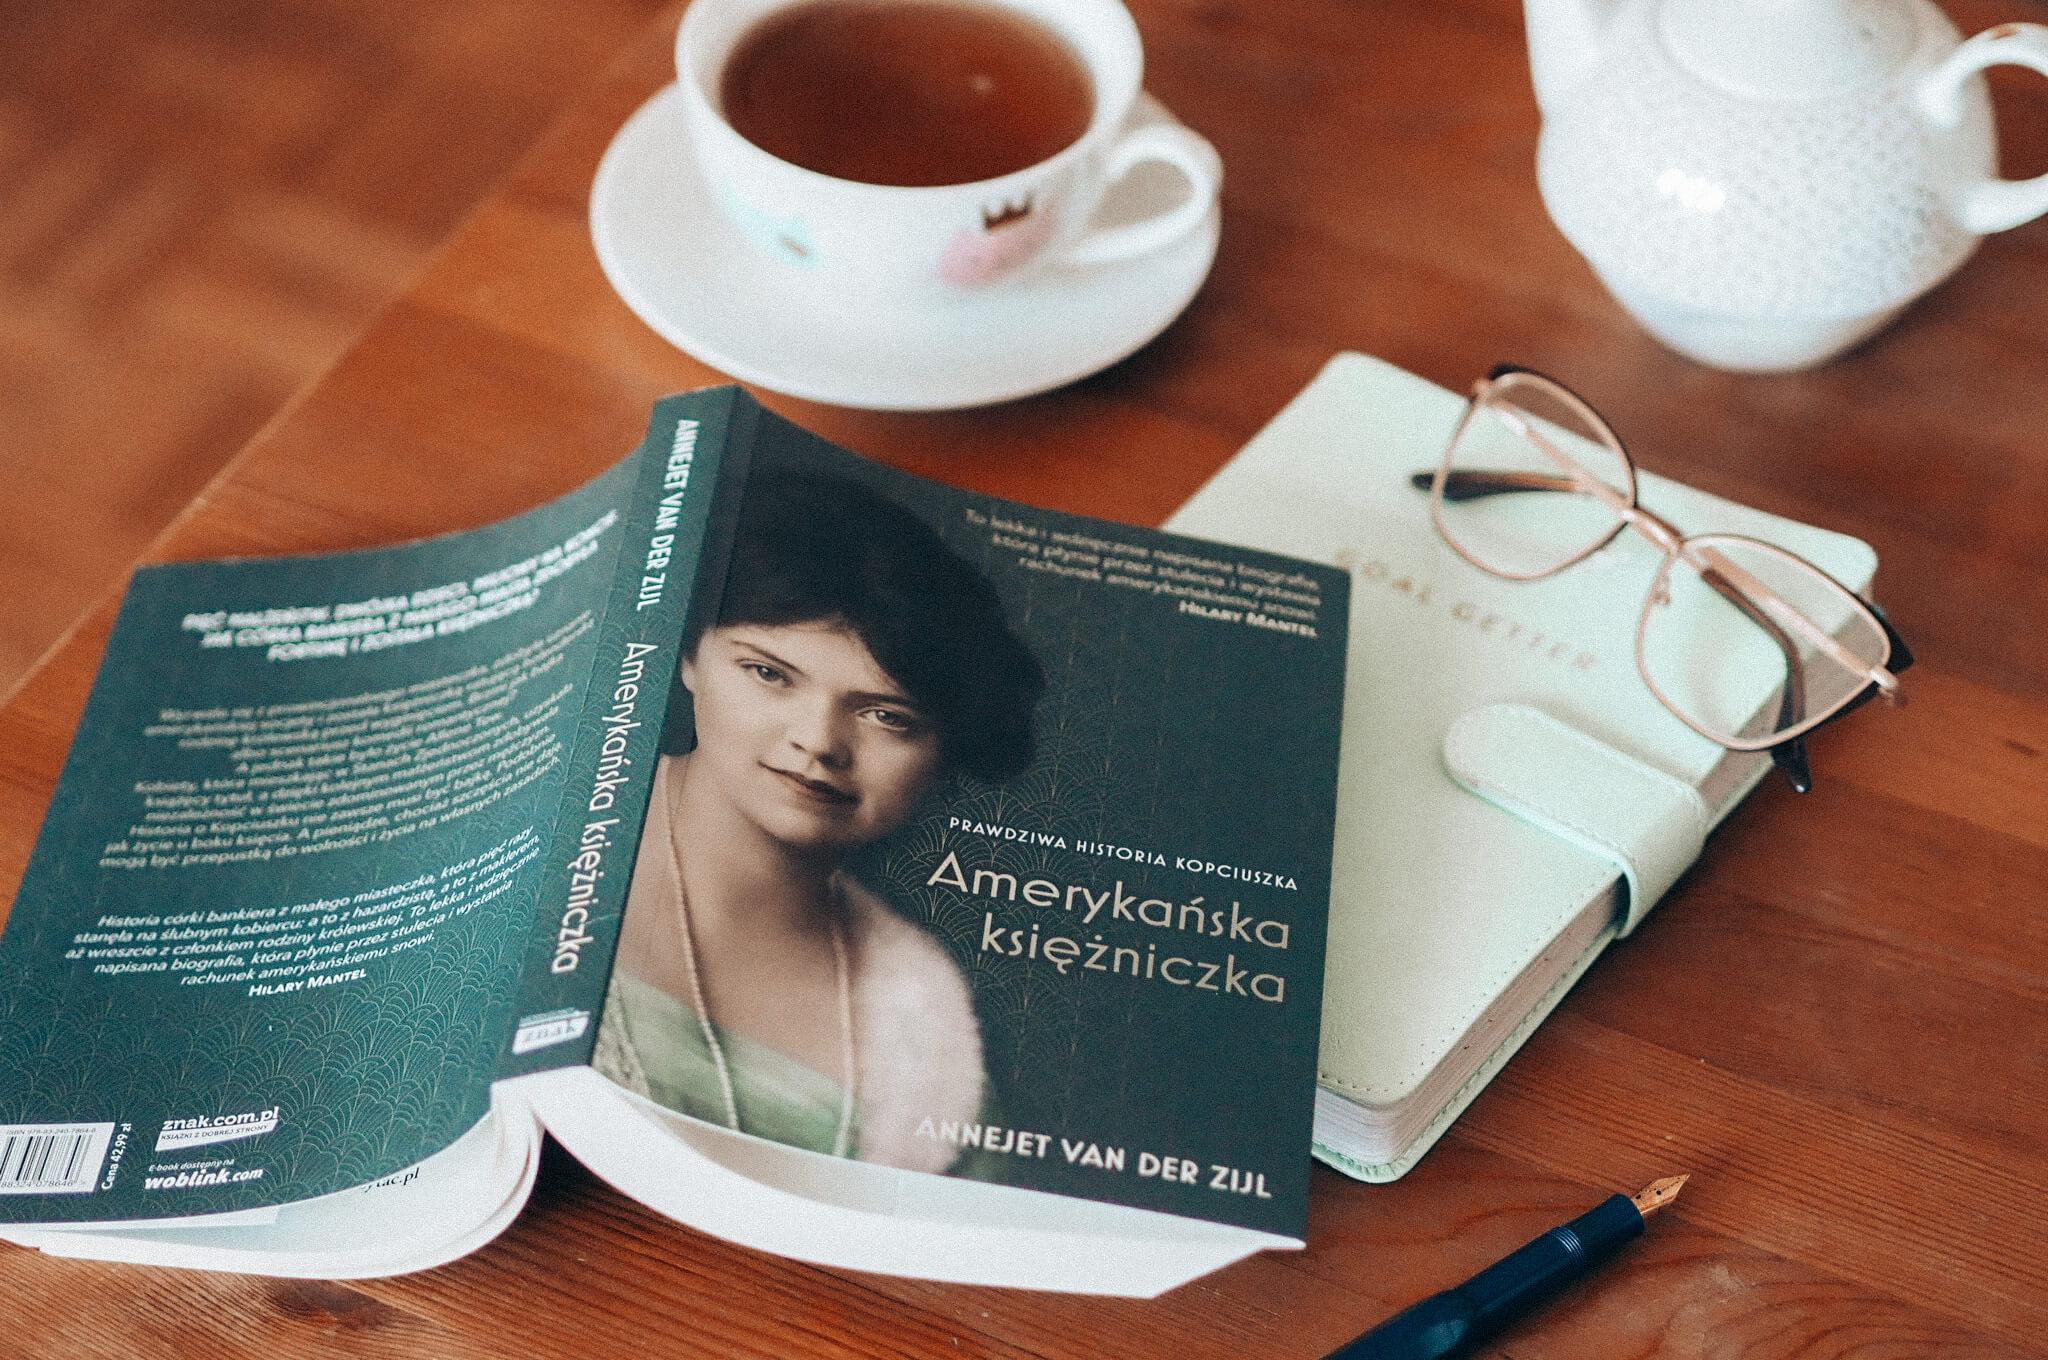 Amerykańska księżniczka - Annejet van der Zijl